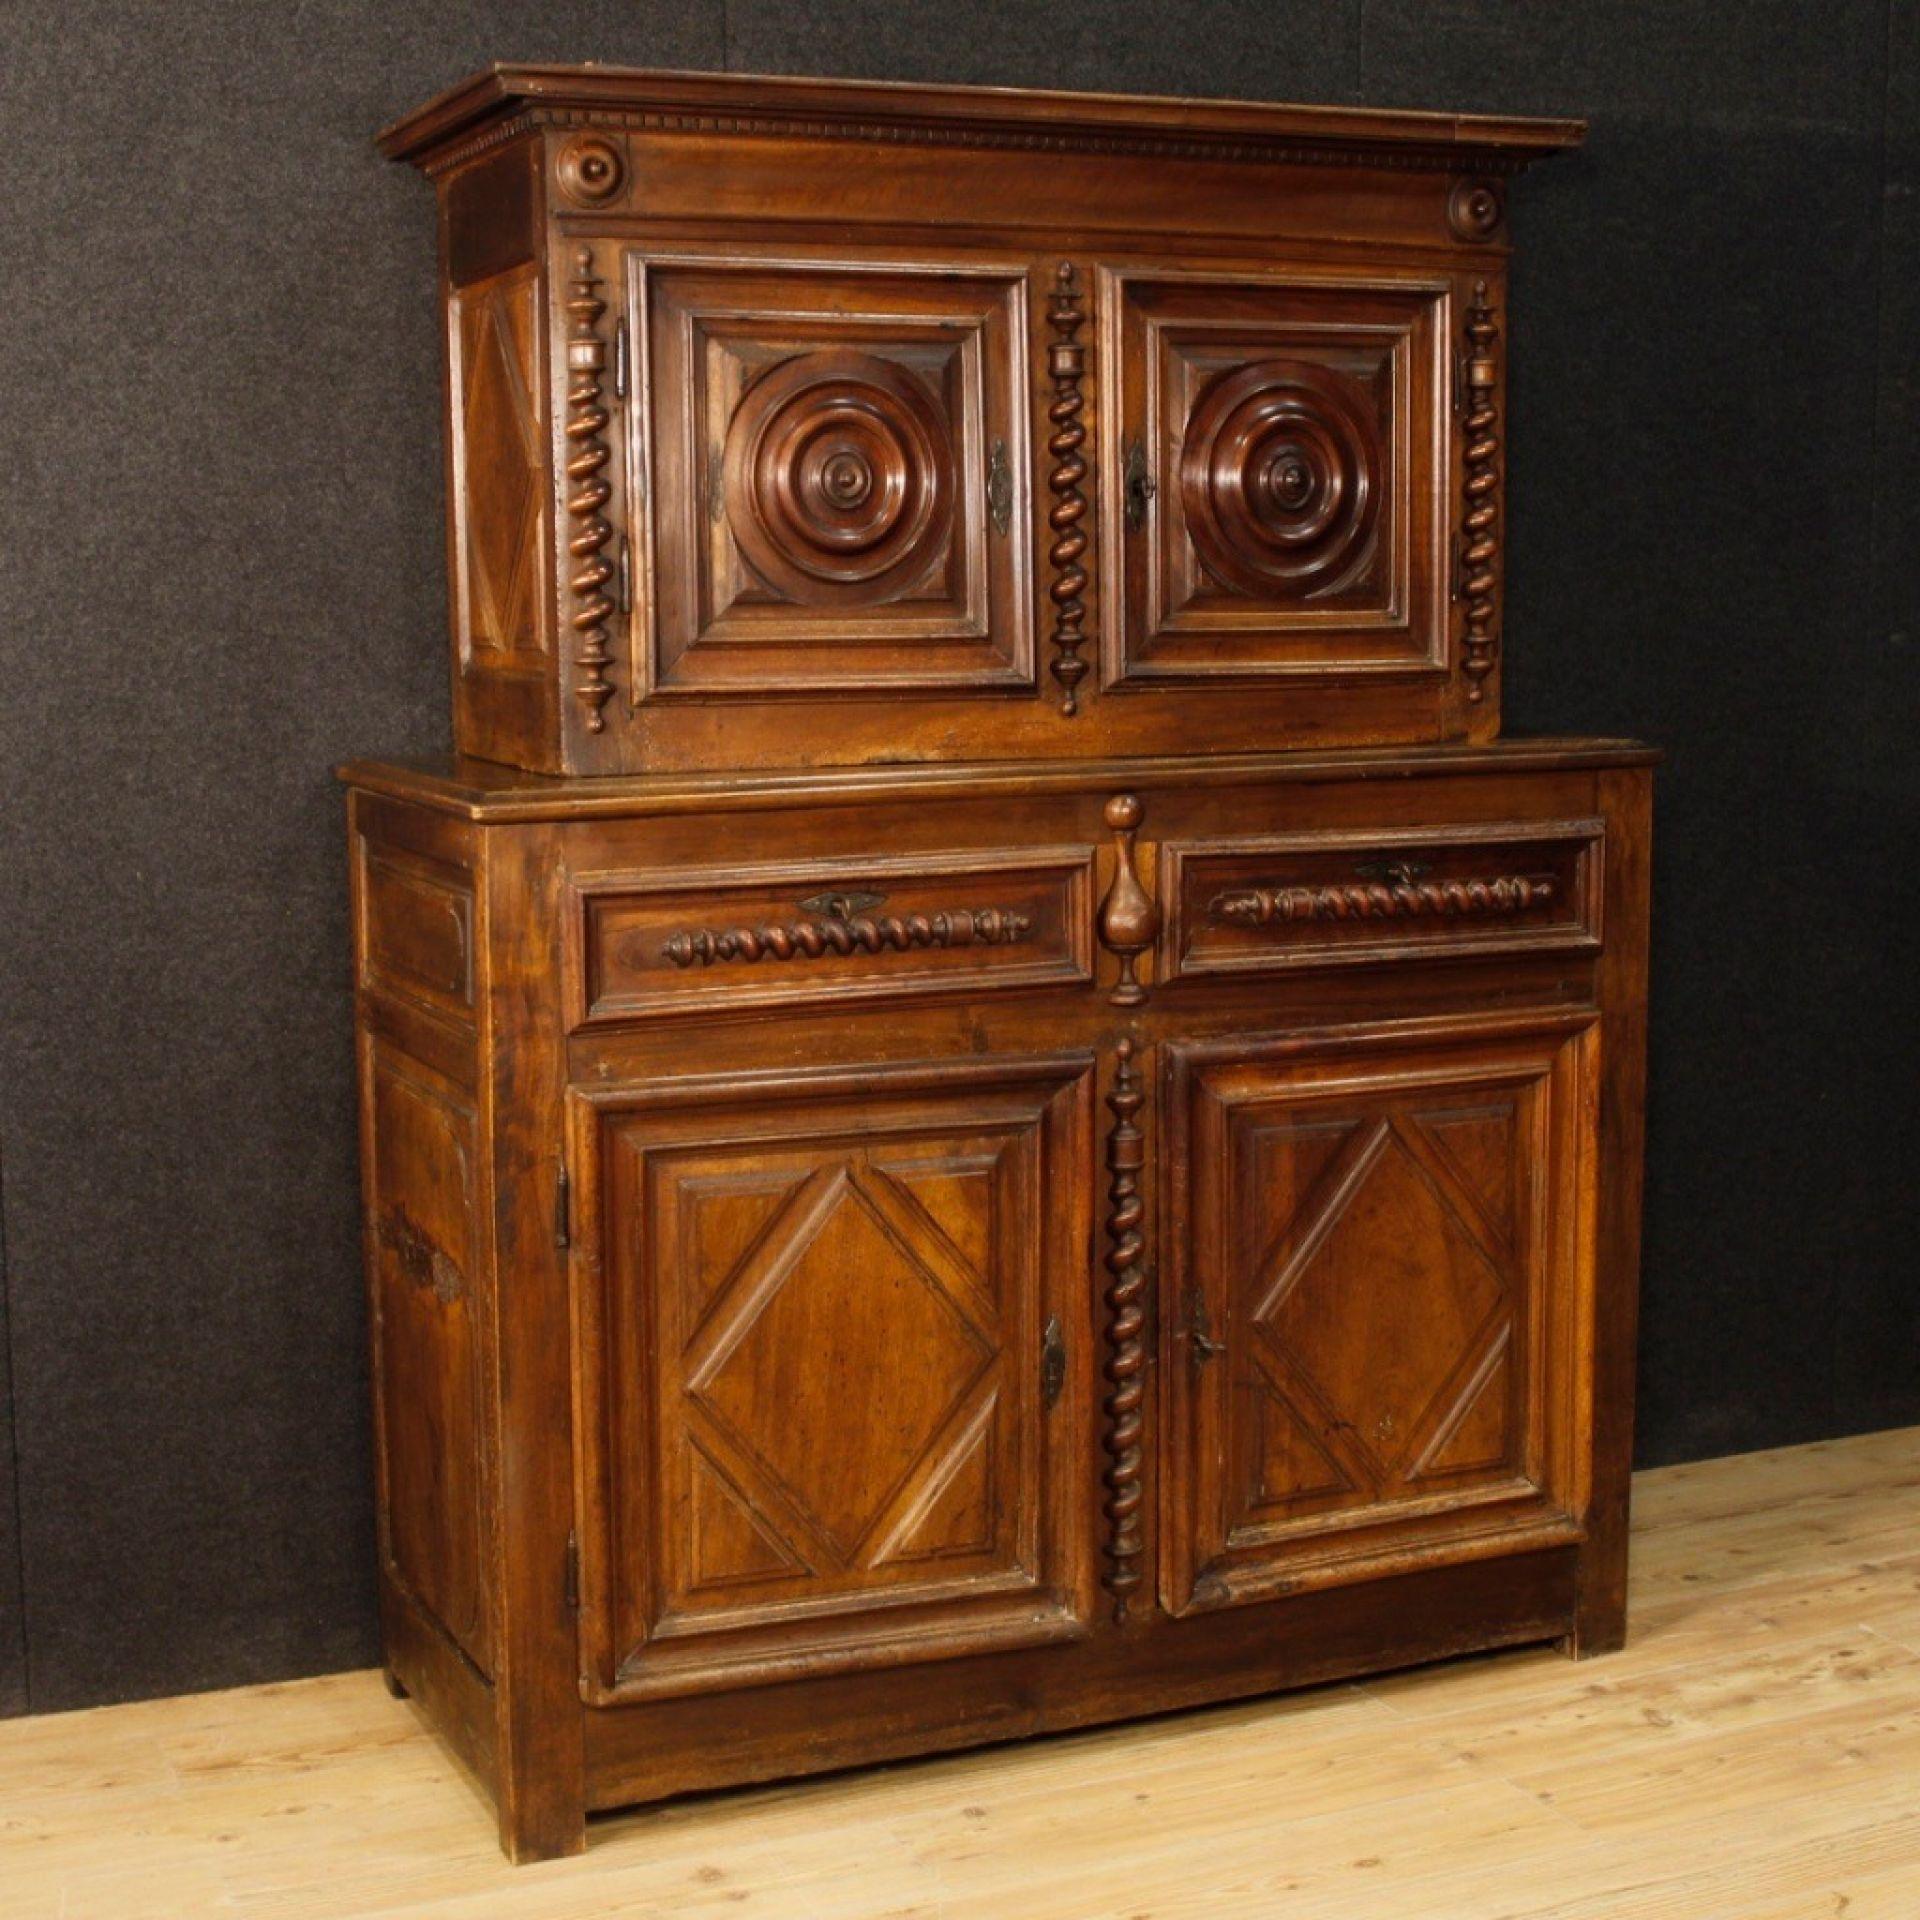 18th Century Walnut Wood French Louis XIII Style Double Body Cupboard, 1770